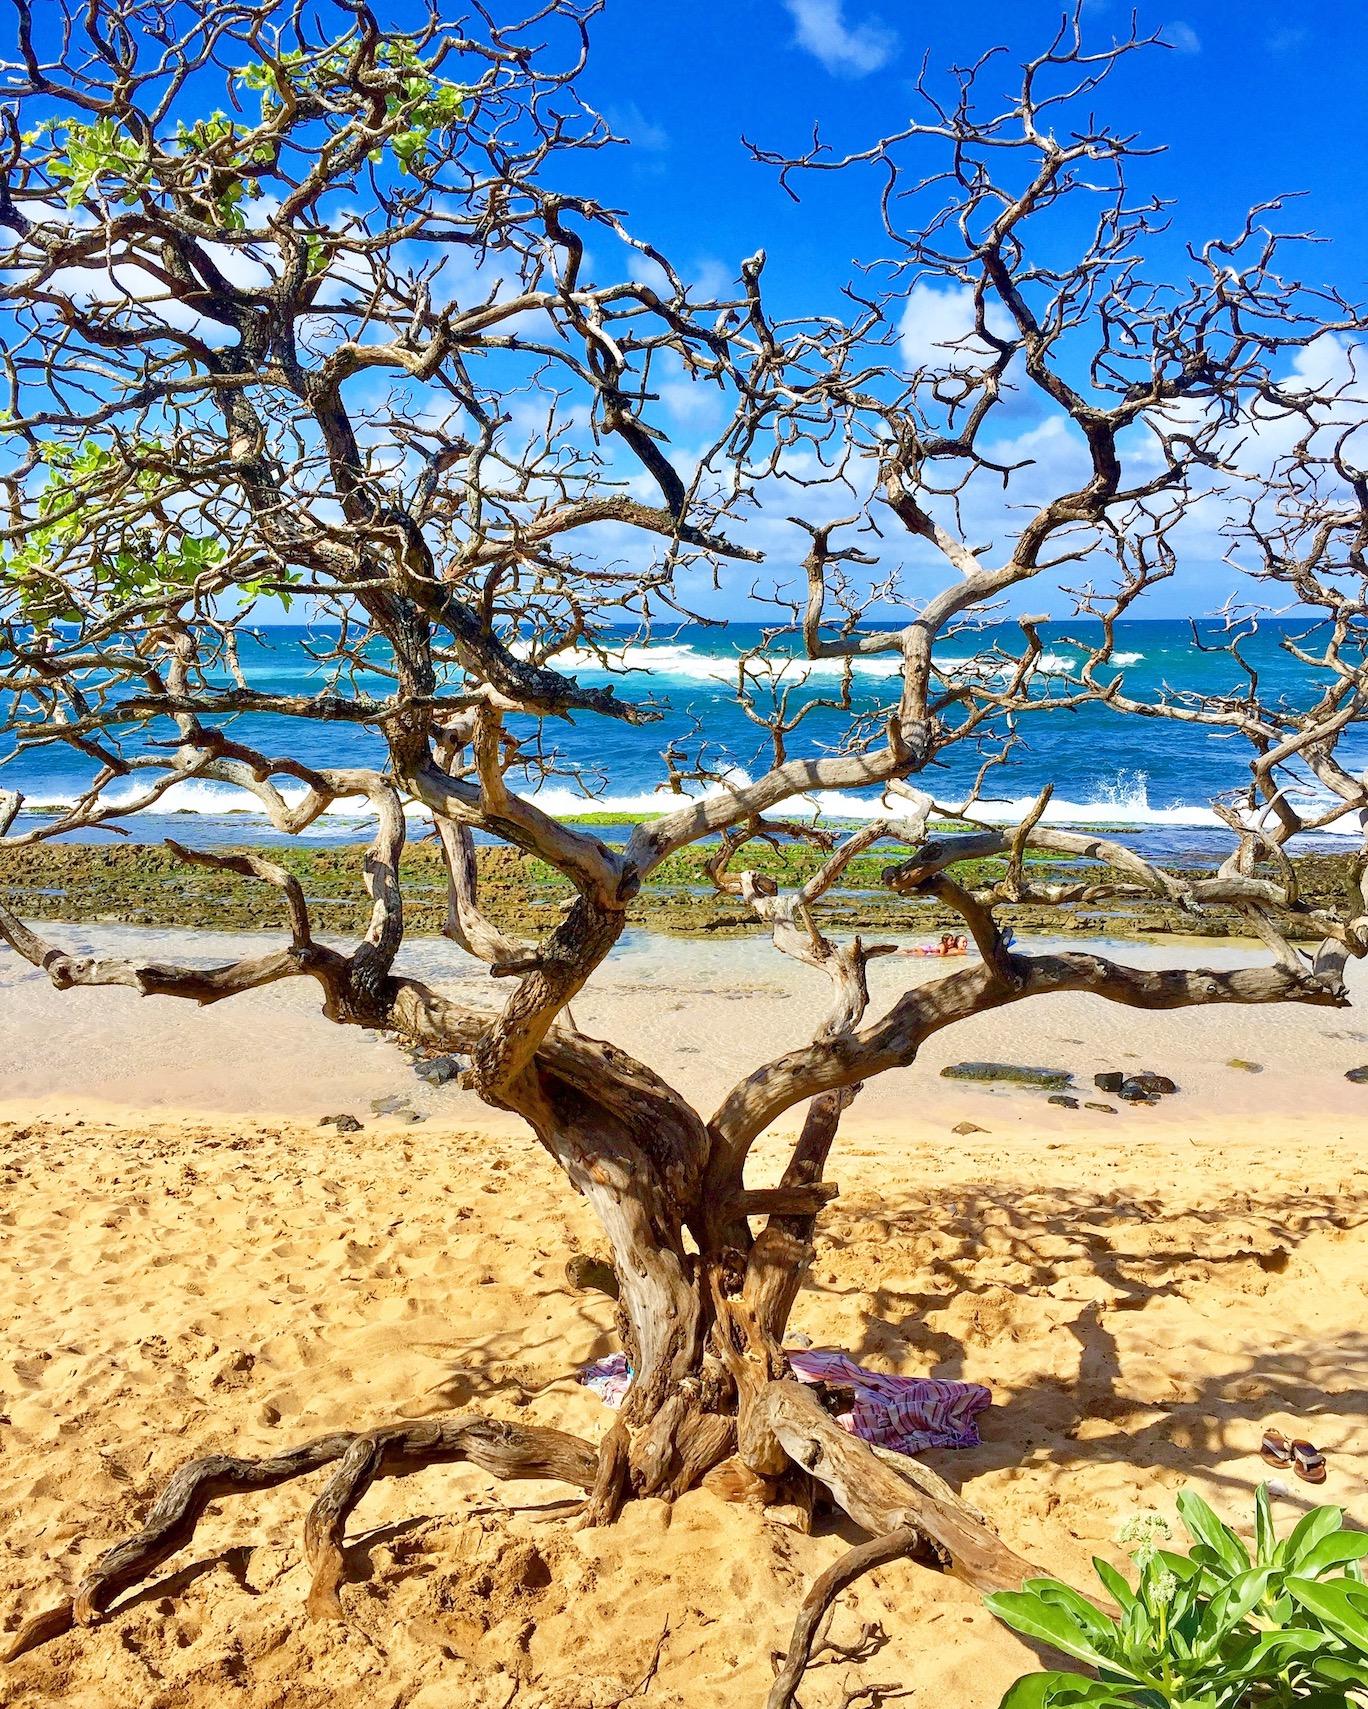 web-design-pueo-creations-maui-hookipa-beach